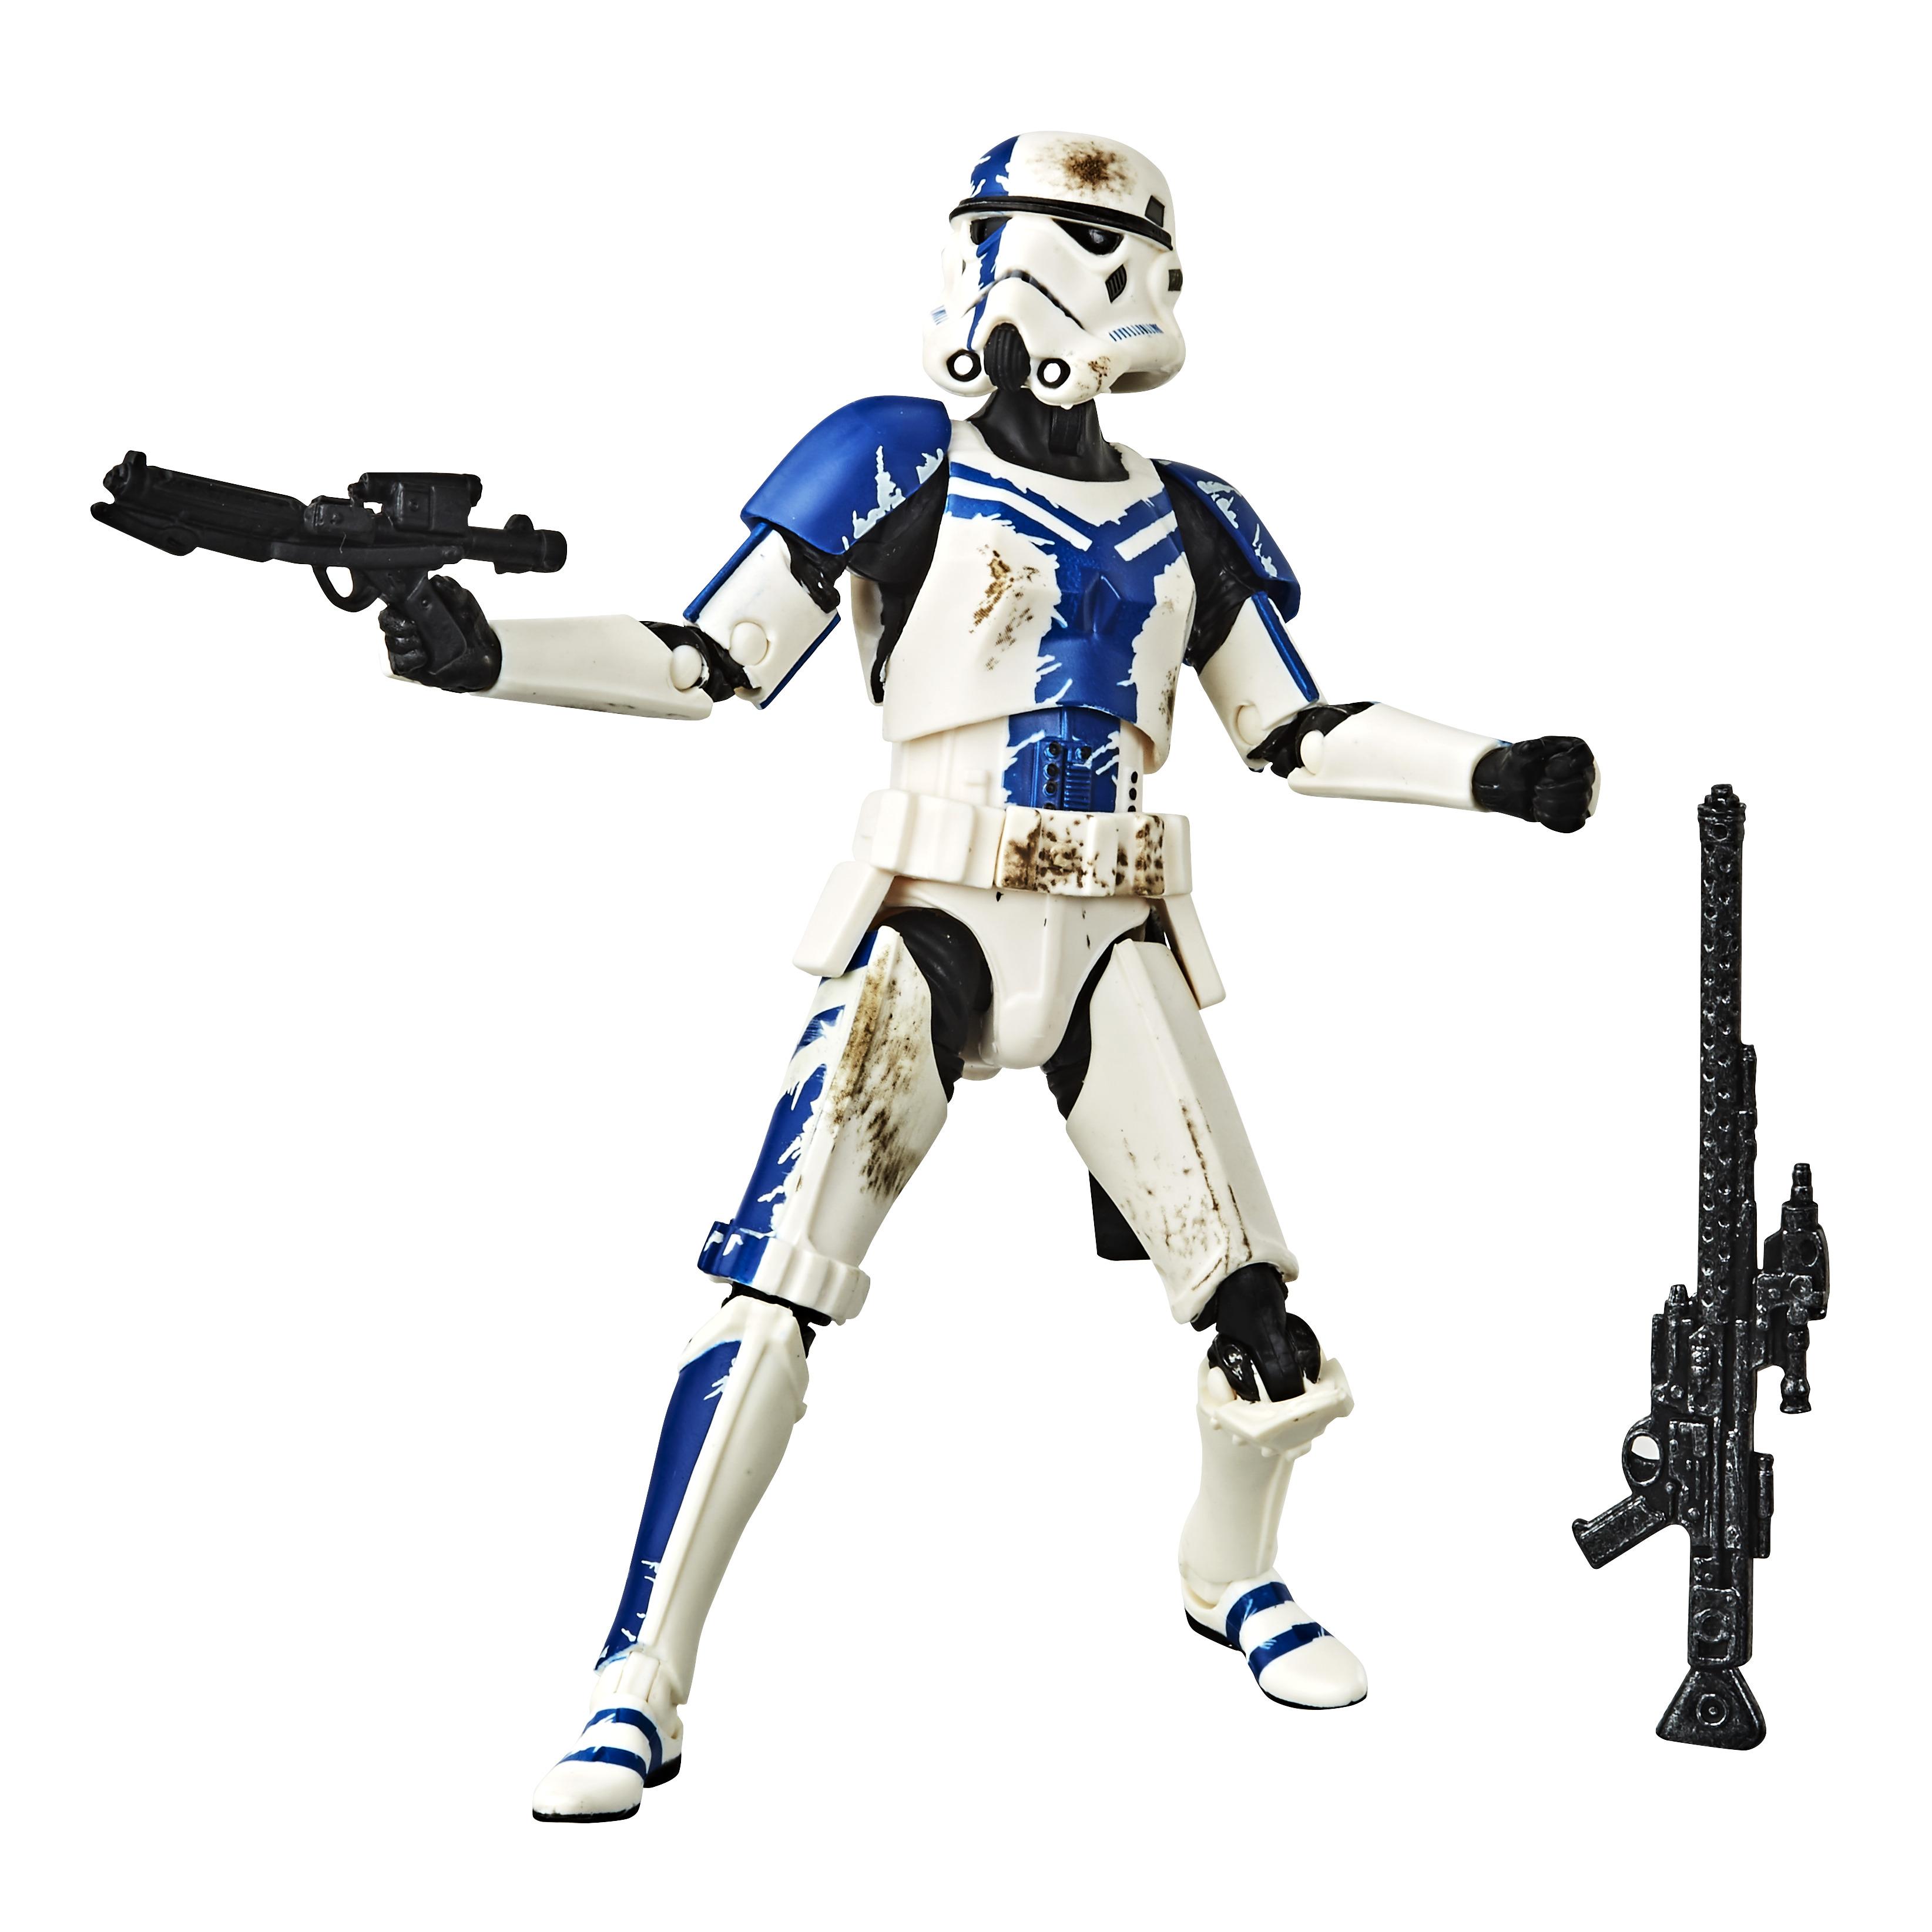 "Star Wars The Black Series Stormtrooper Commander Action Figure 6"" Reihe E9497 5010993689552"